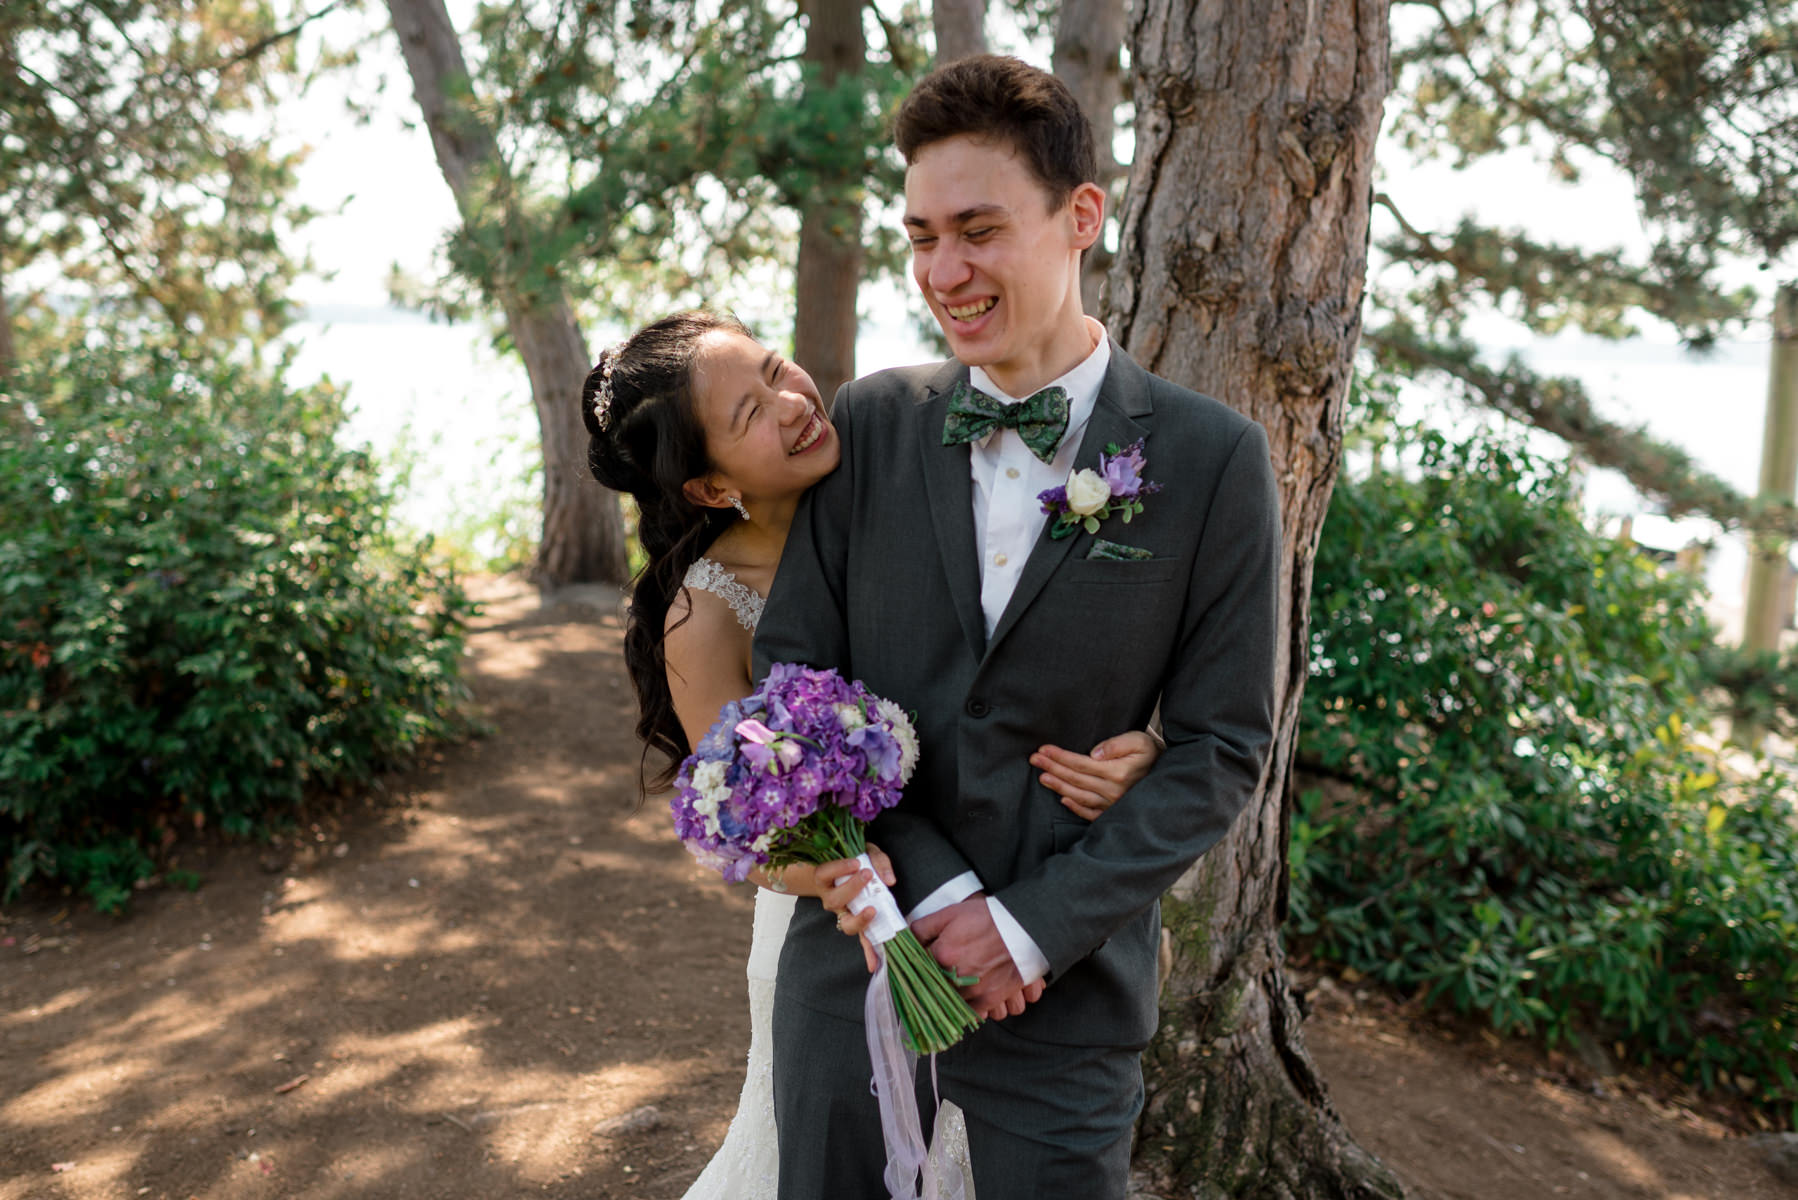 Andrew Tat - Documentary Wedding Photography - Heritage Hall - Kirkland, Washington - Grace & James - 28.JPG